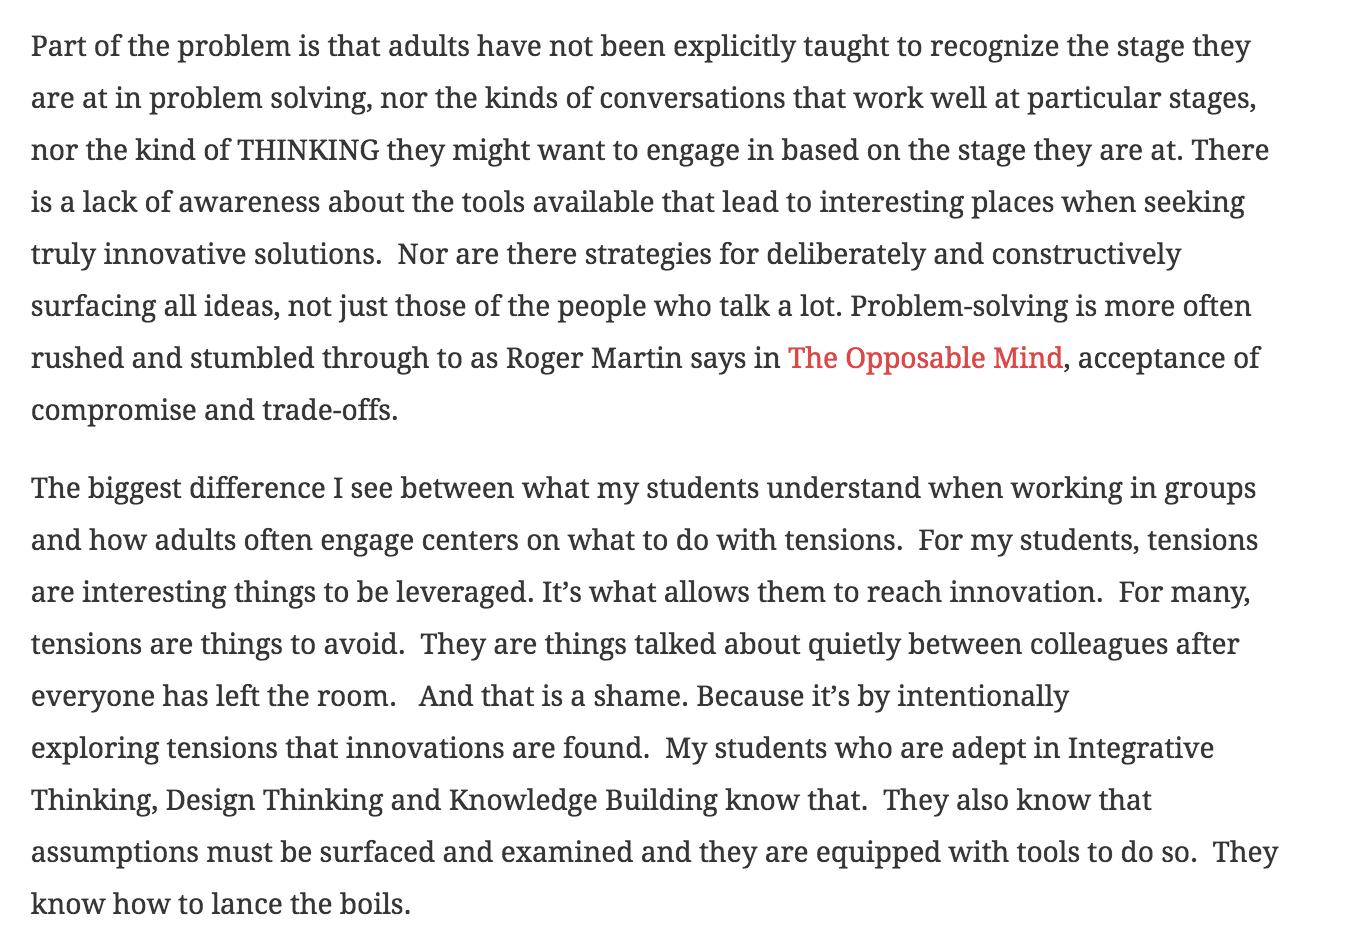 From Heidi Siwak, The Very Strange World of Adult Problem Solving, http://www.heidisiwak.com/2016/03/the-very-strange-world-of-adult-problem-solving/